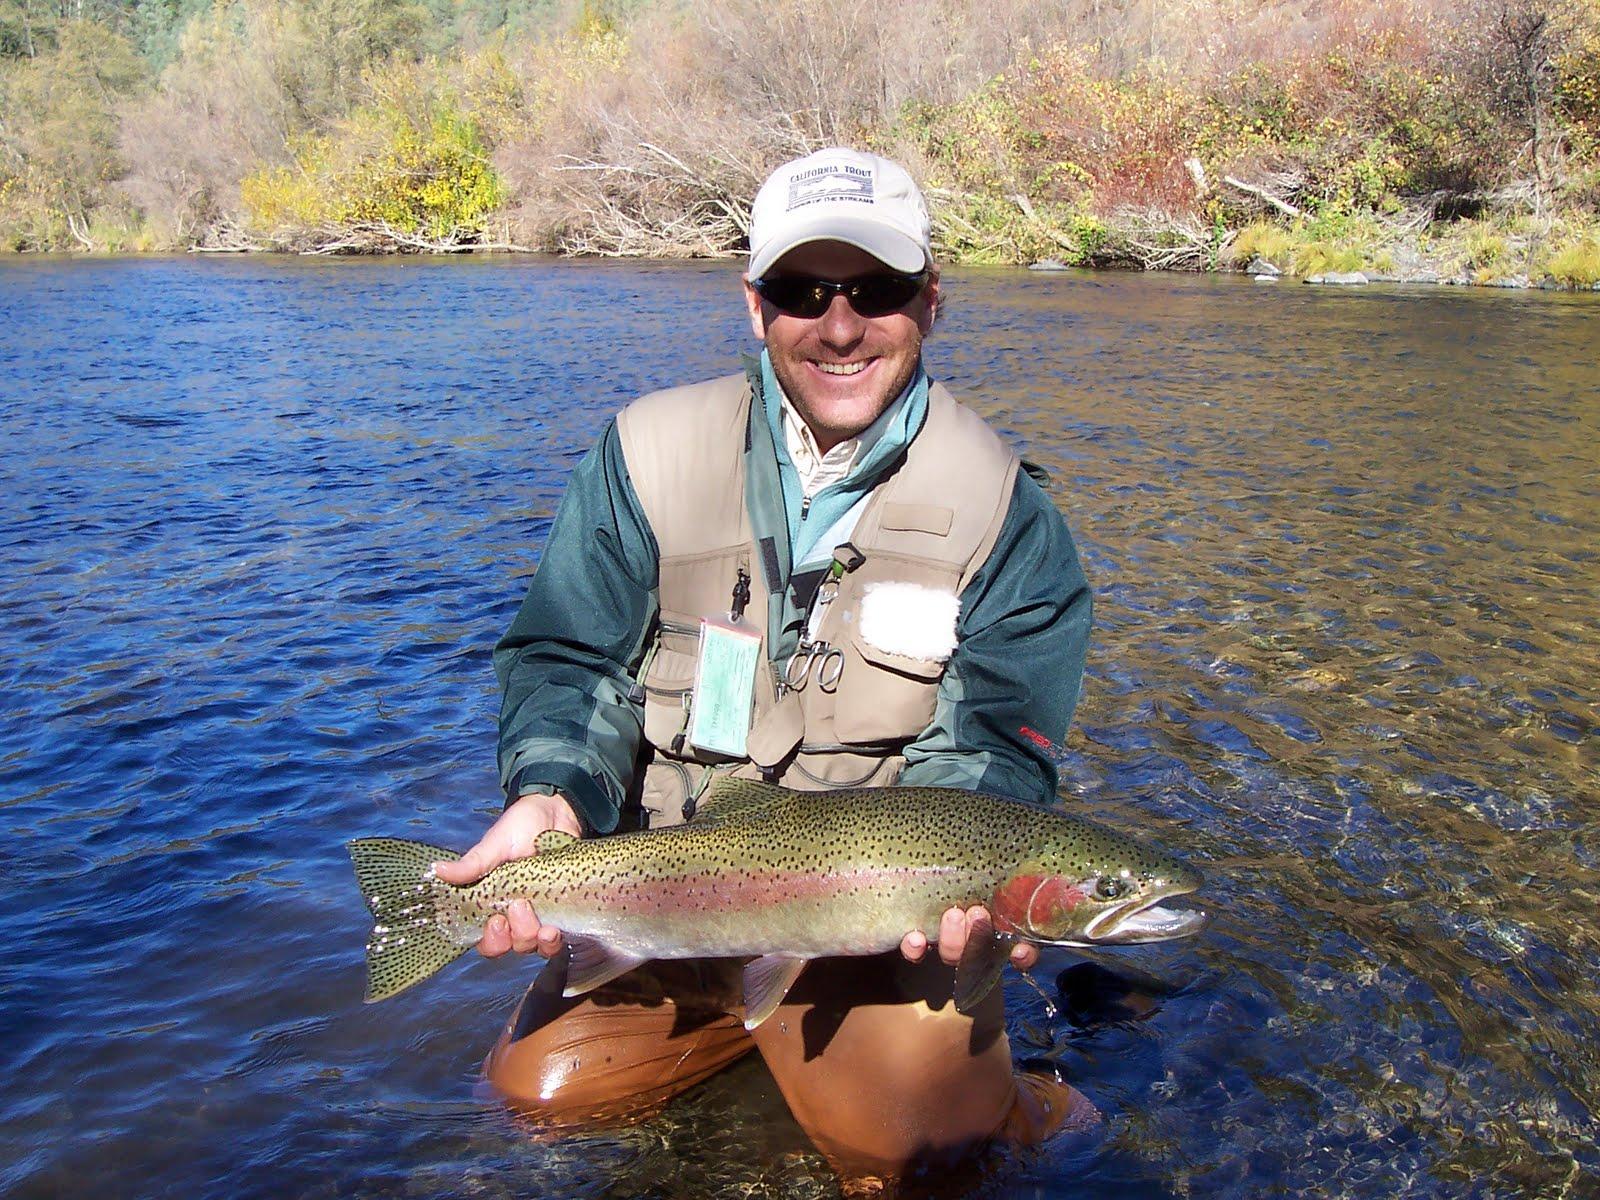 Northern sierra fly fishing a visual ode to steelhead for Sierra fly fishing